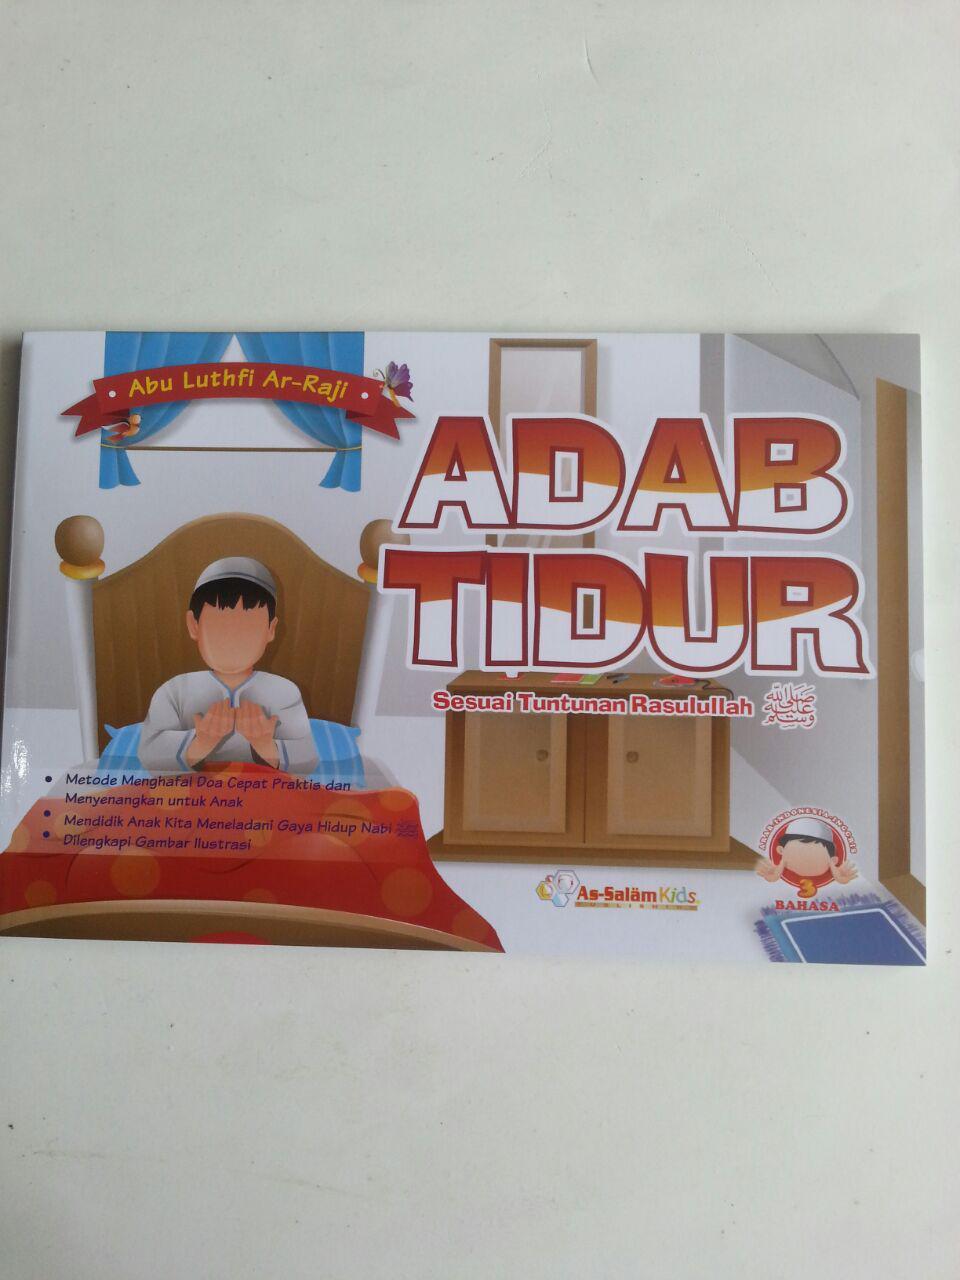 Buku Anak Adab Tidur Sesuai Tuntunan Rasulullah cover 2